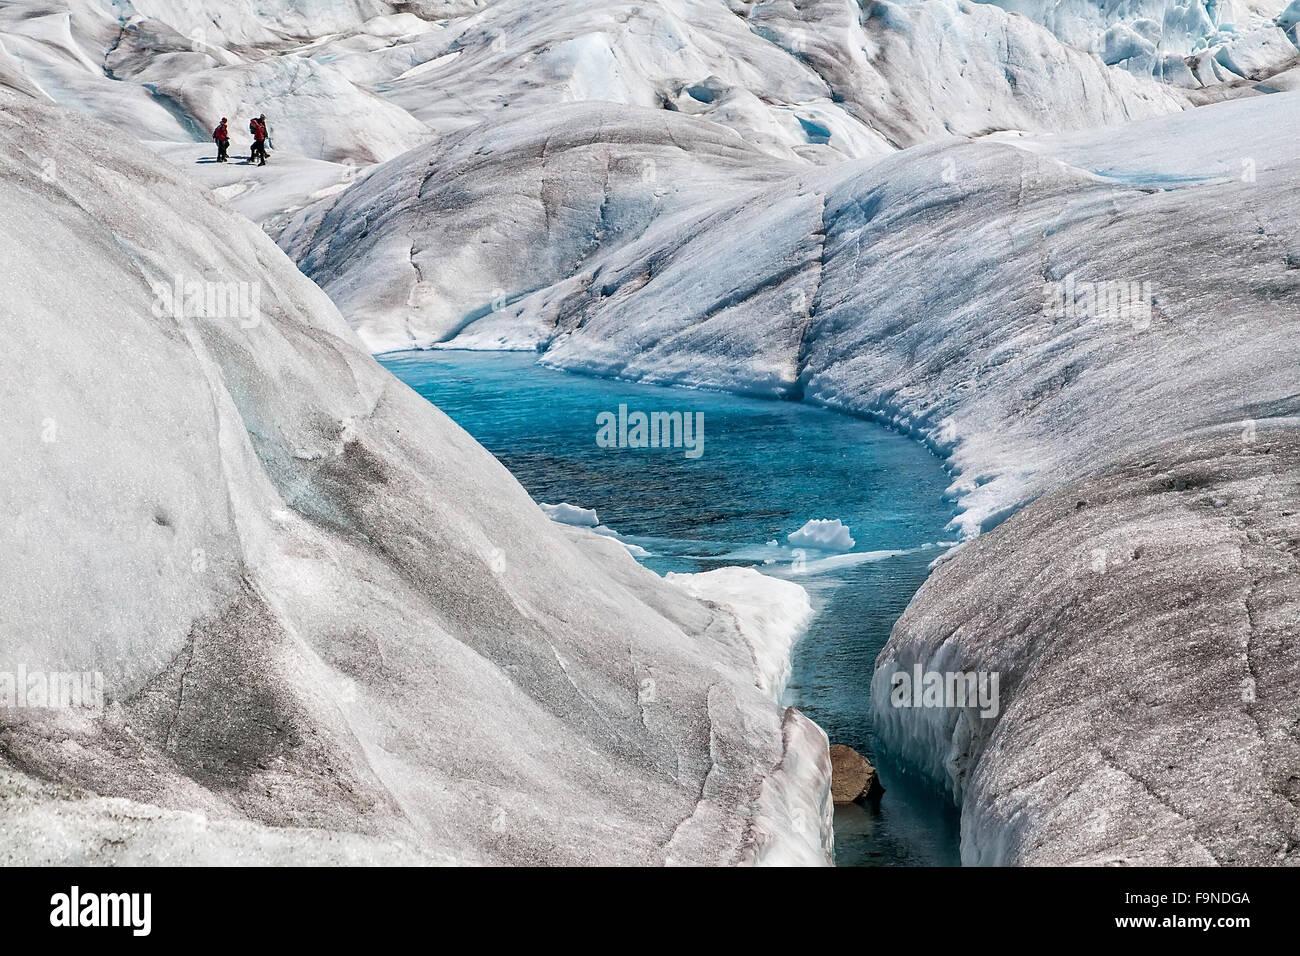 Natural blue-colored pools on Mendenhall Glacier in Juneau, Alaska. - Stock Image